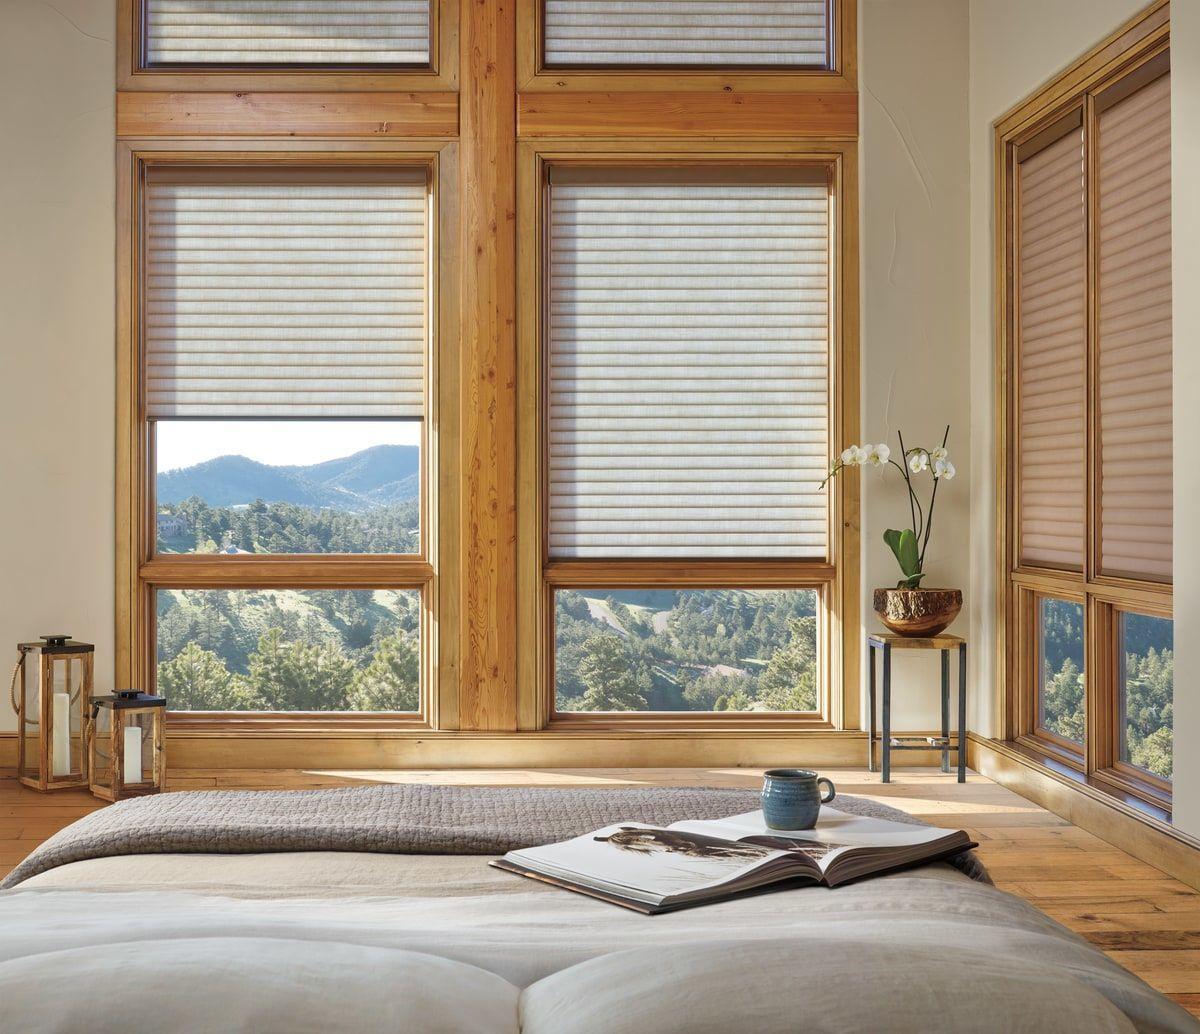 Dining Room Window Blinds Adorable Hunter Douglas Sonnette Cellular Roller Shades Hunter Douglas Review